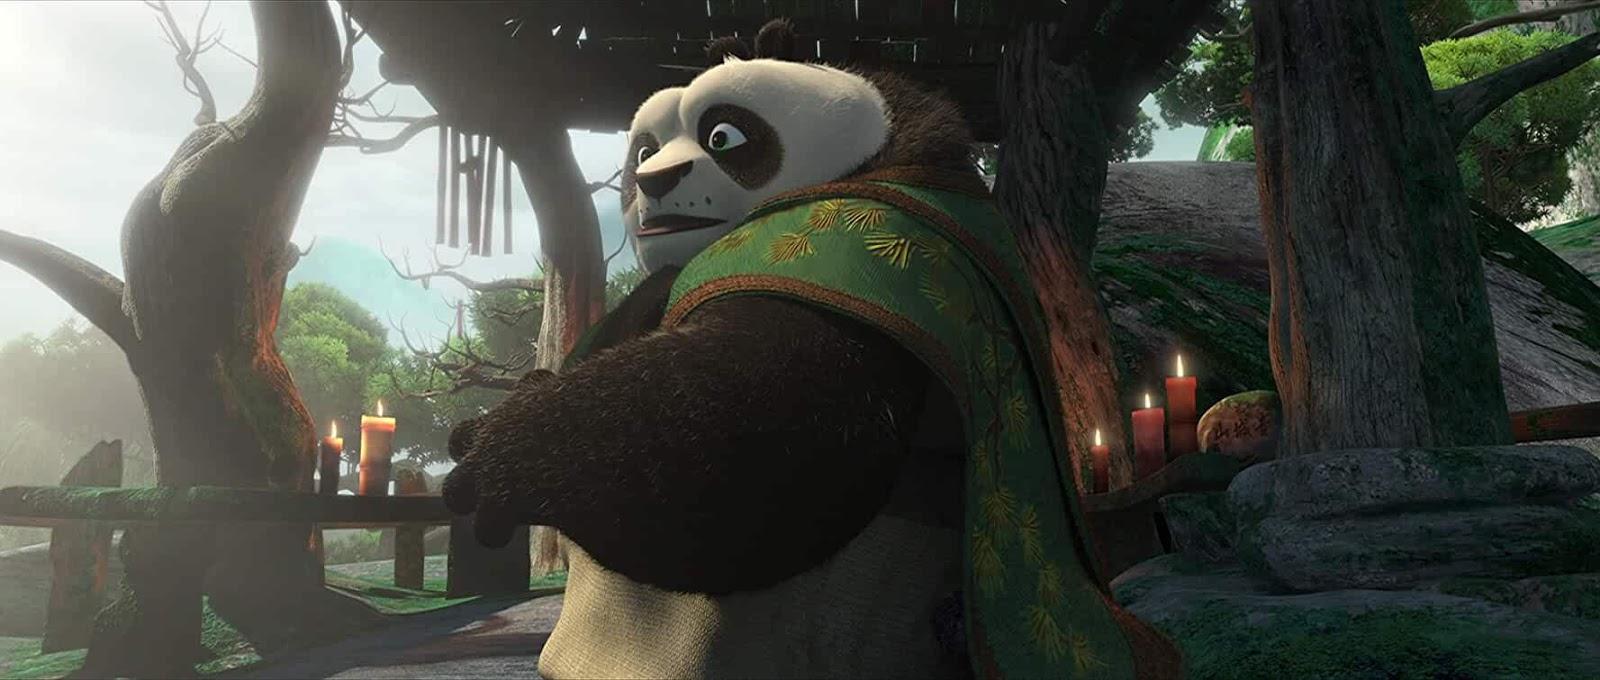 Kung Fu Panda 3 (2016) Full Movie Hindi Dubbed